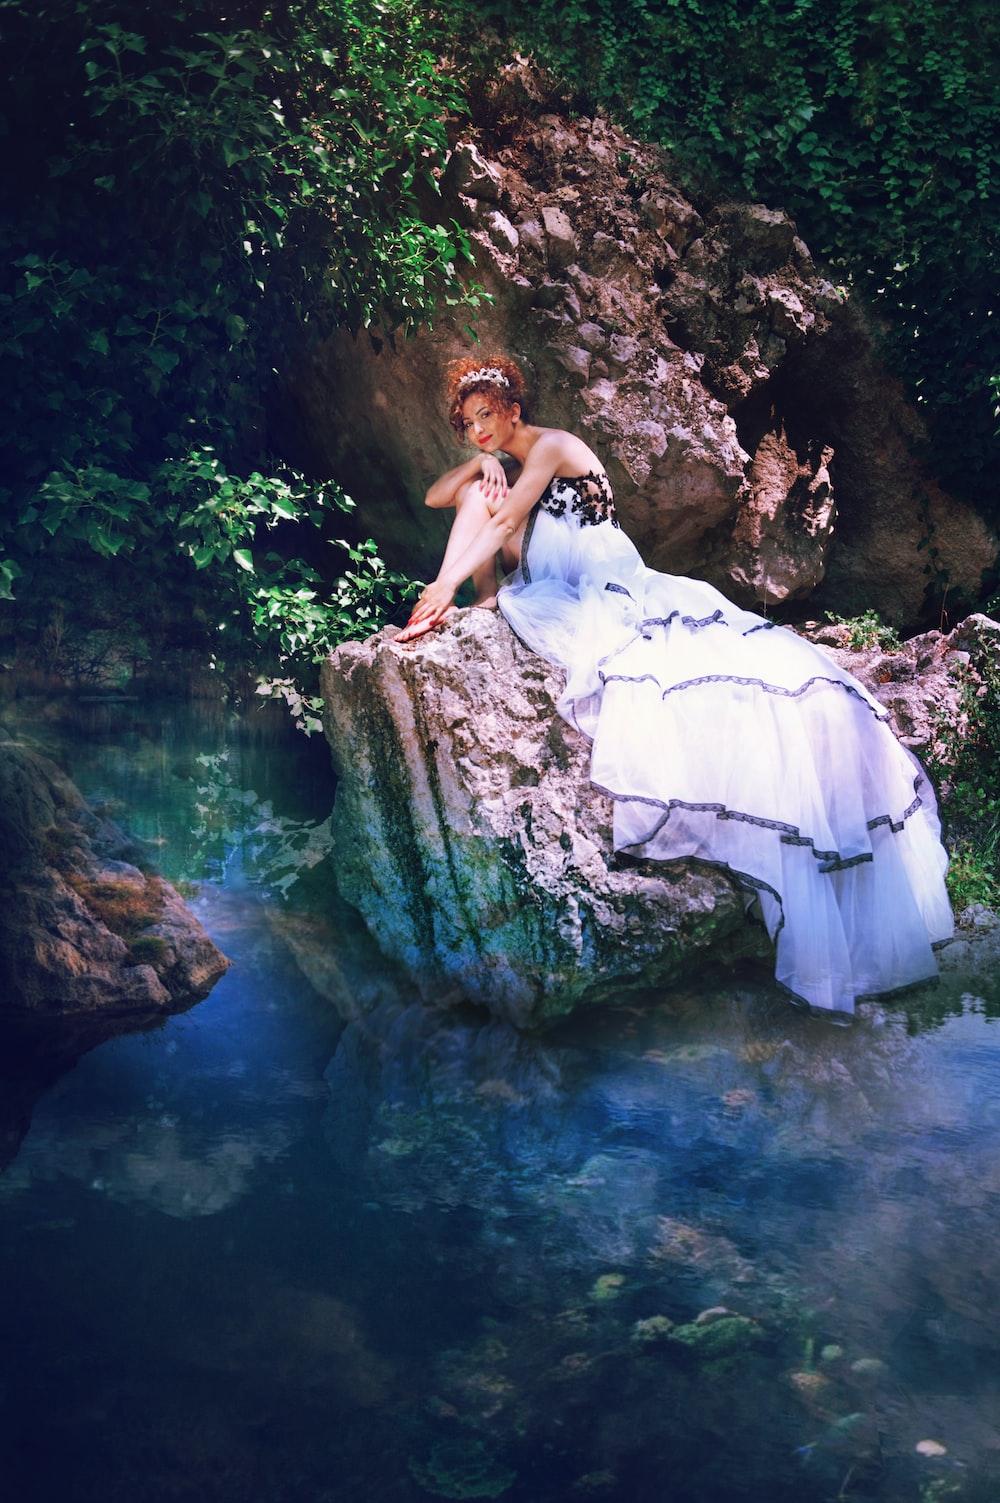 woman in white dress sitting on rock in water